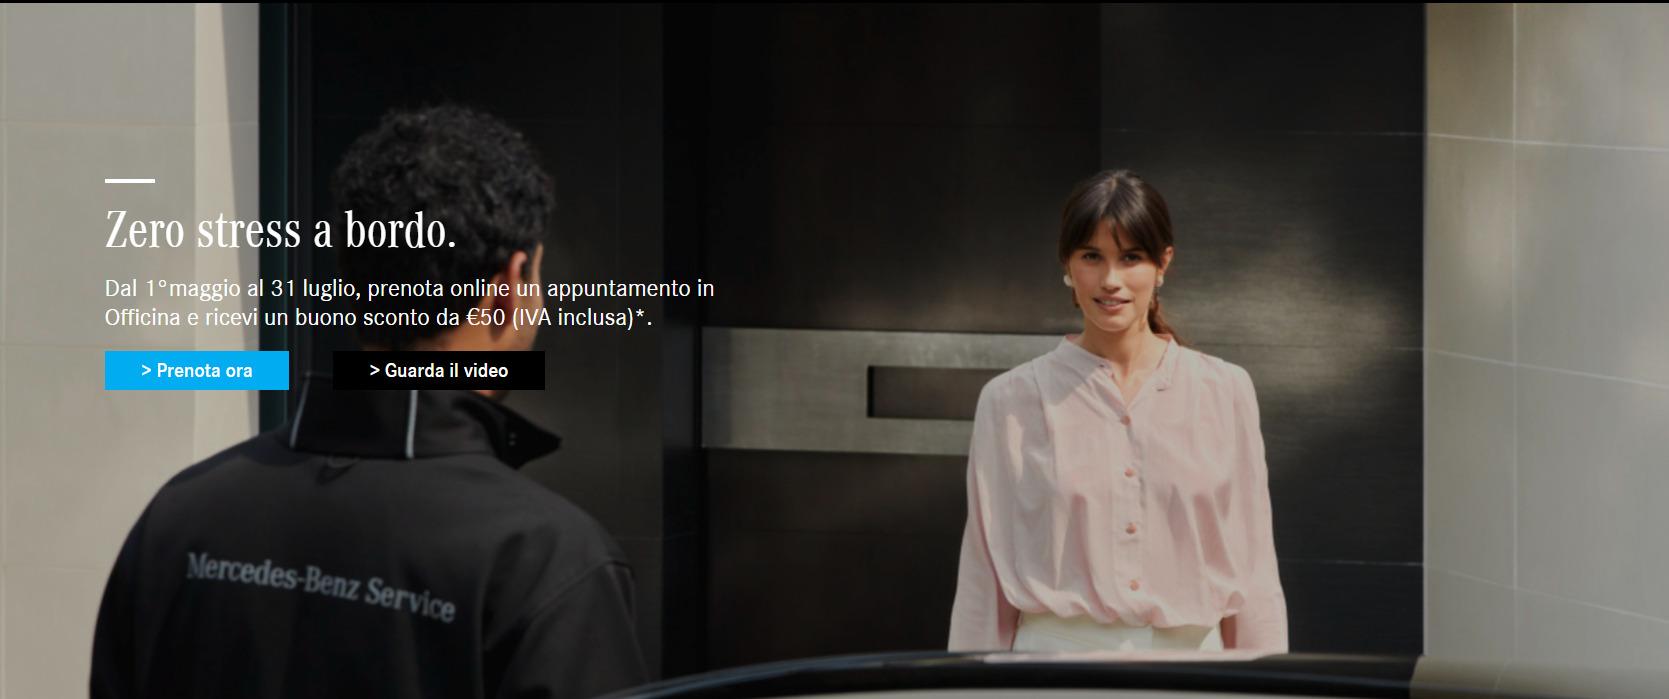 Mercedes-campagna-Mercedes campagna stressfreetressfree